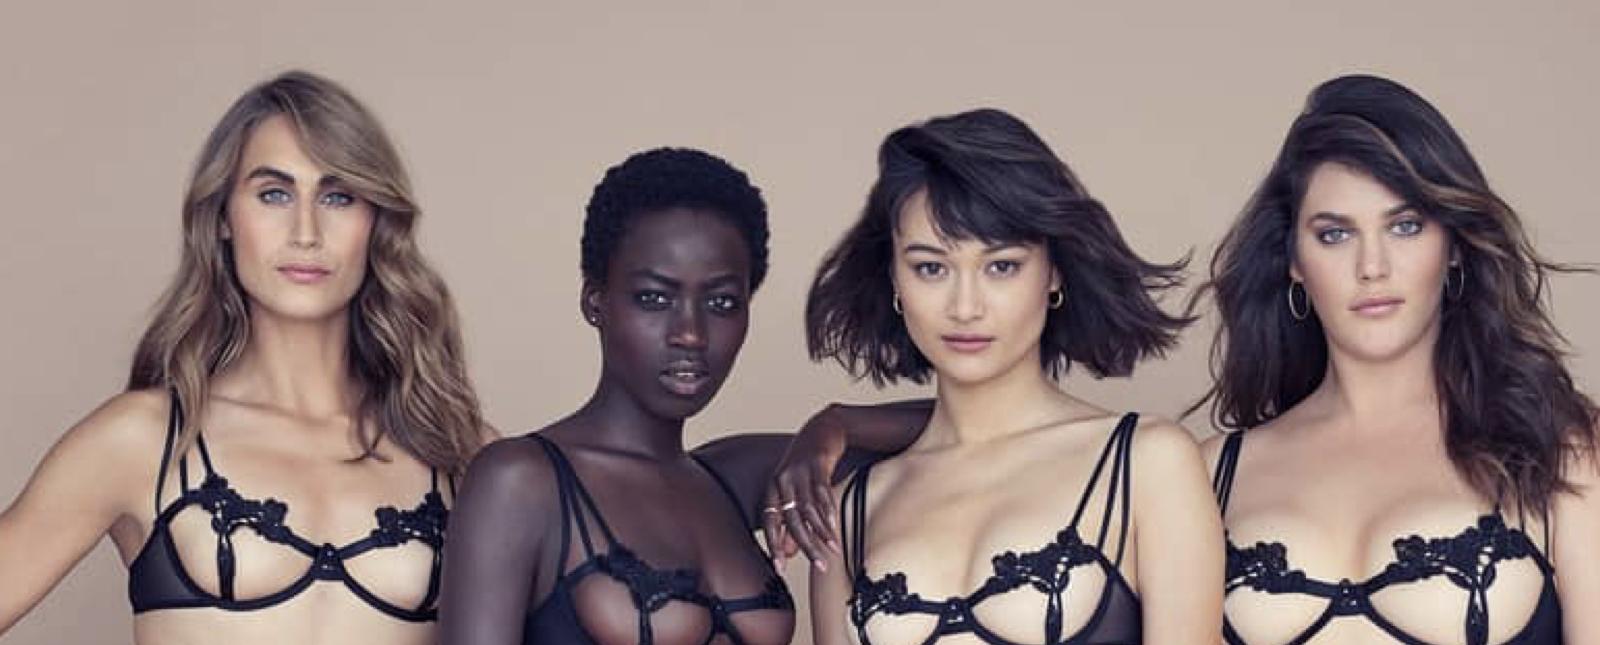 victorias-secret-modelos-trans-plus-size-inclusiva